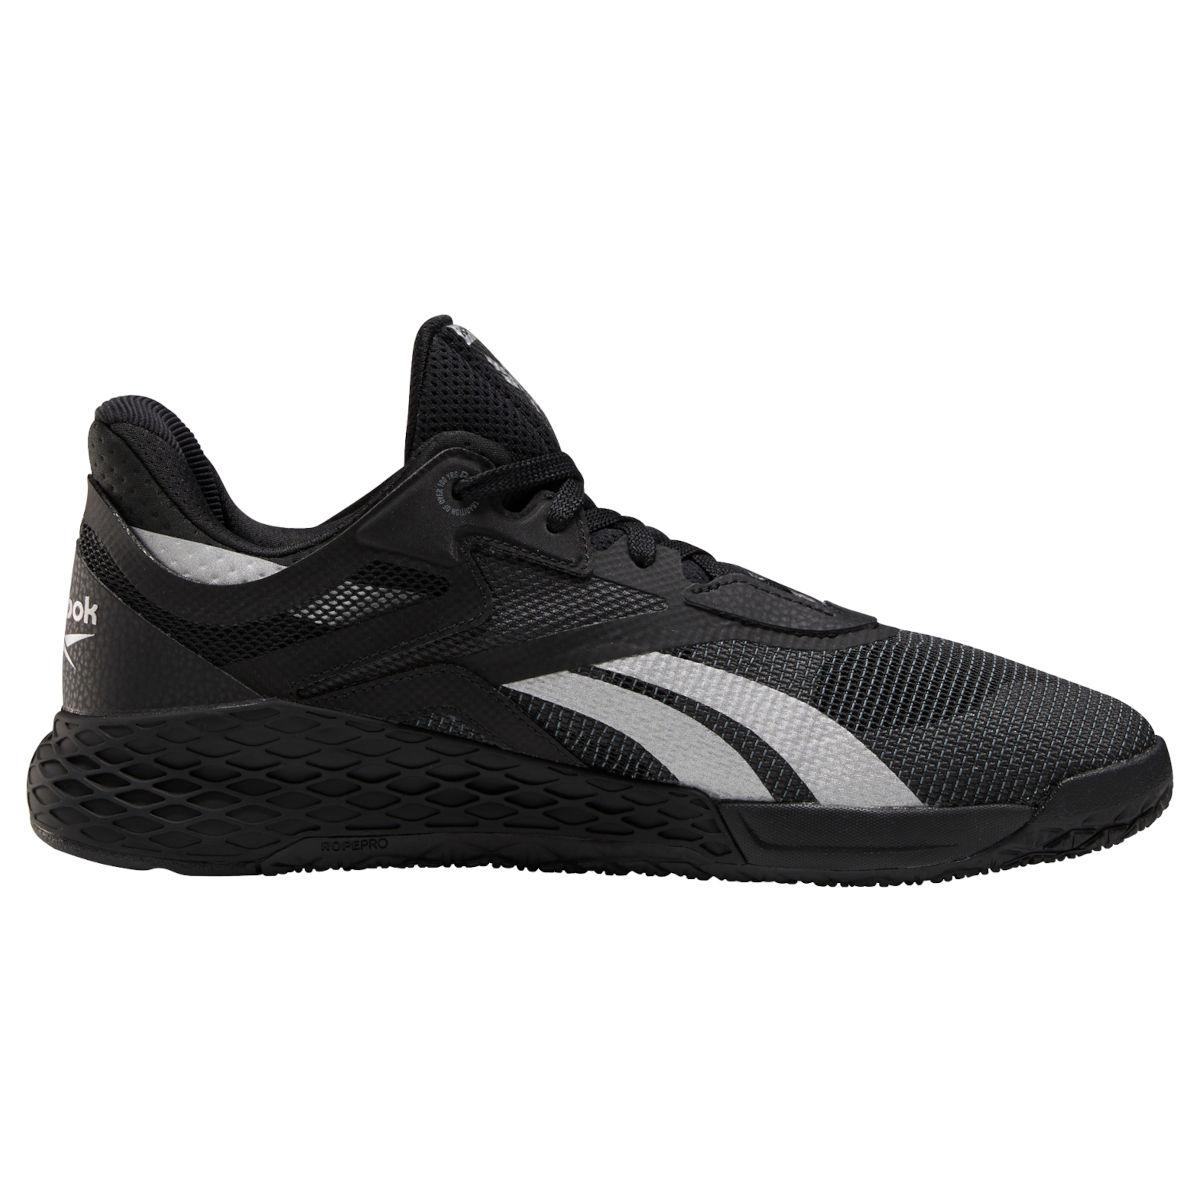 Reebok Männer Nano X Fitness-Schuh - black/silver met./cold grey 6 FY4559